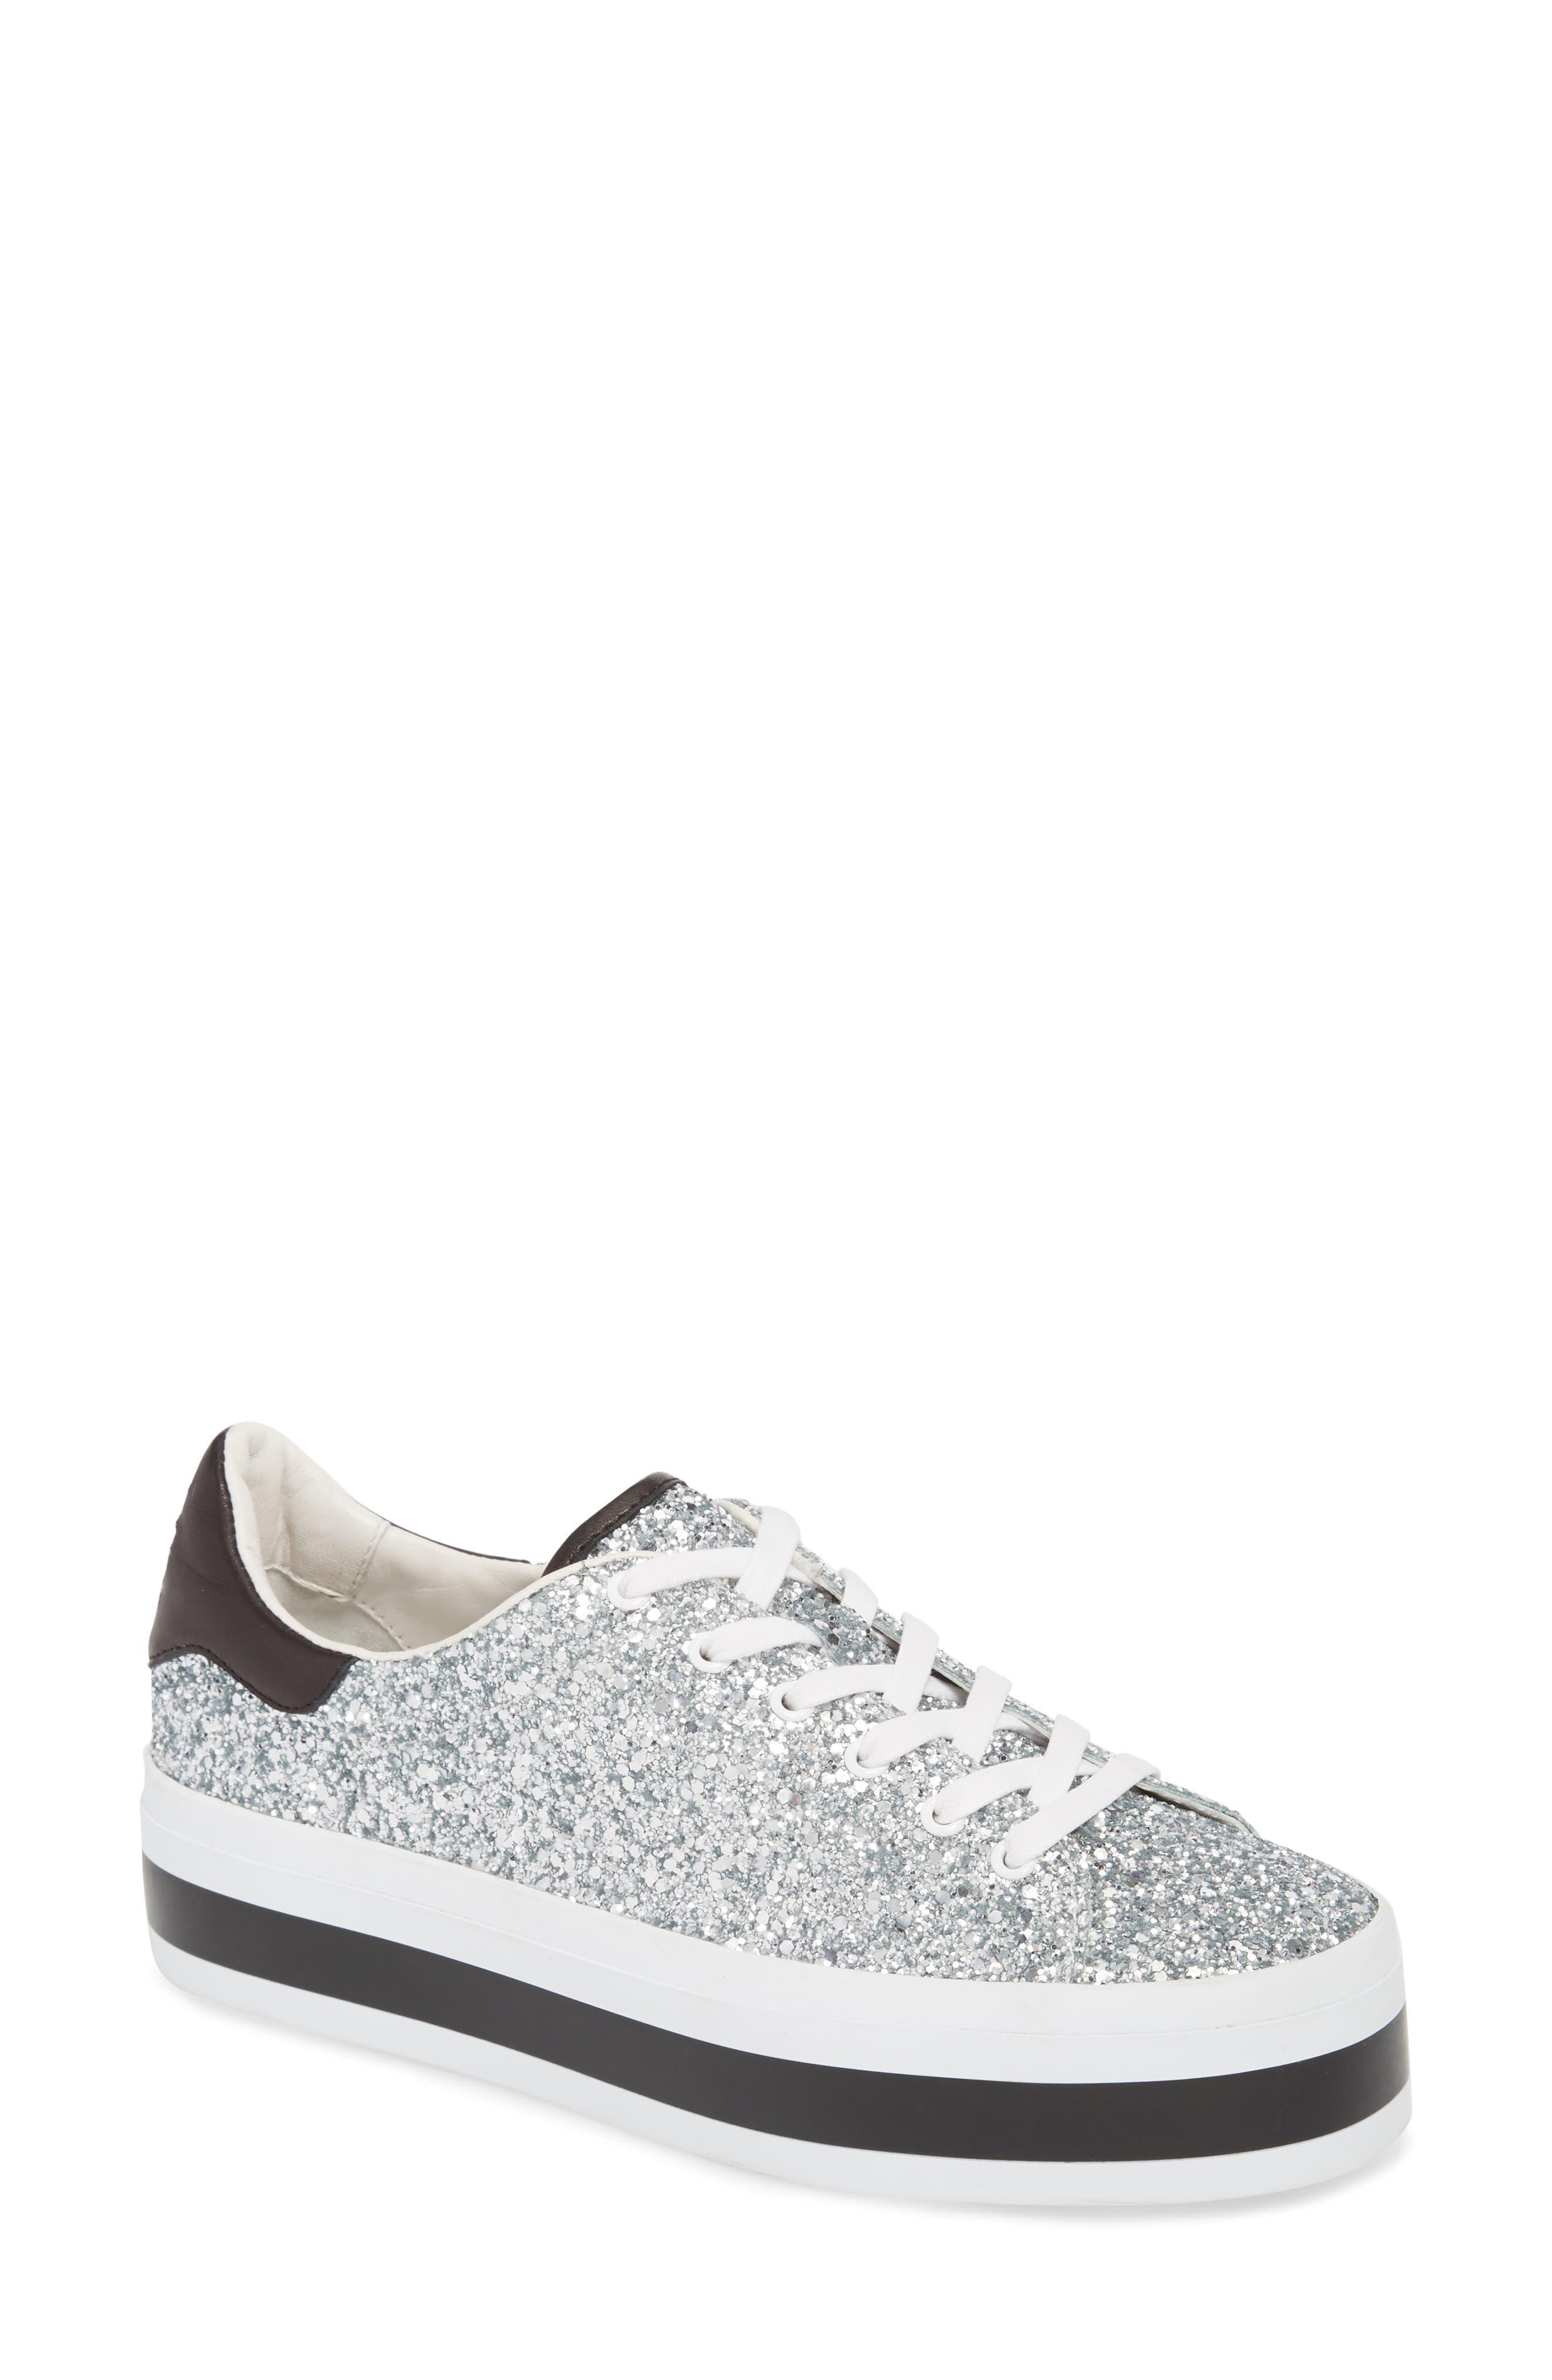 Ezra Flatform Sneaker,                         Main,                         color, SILVER